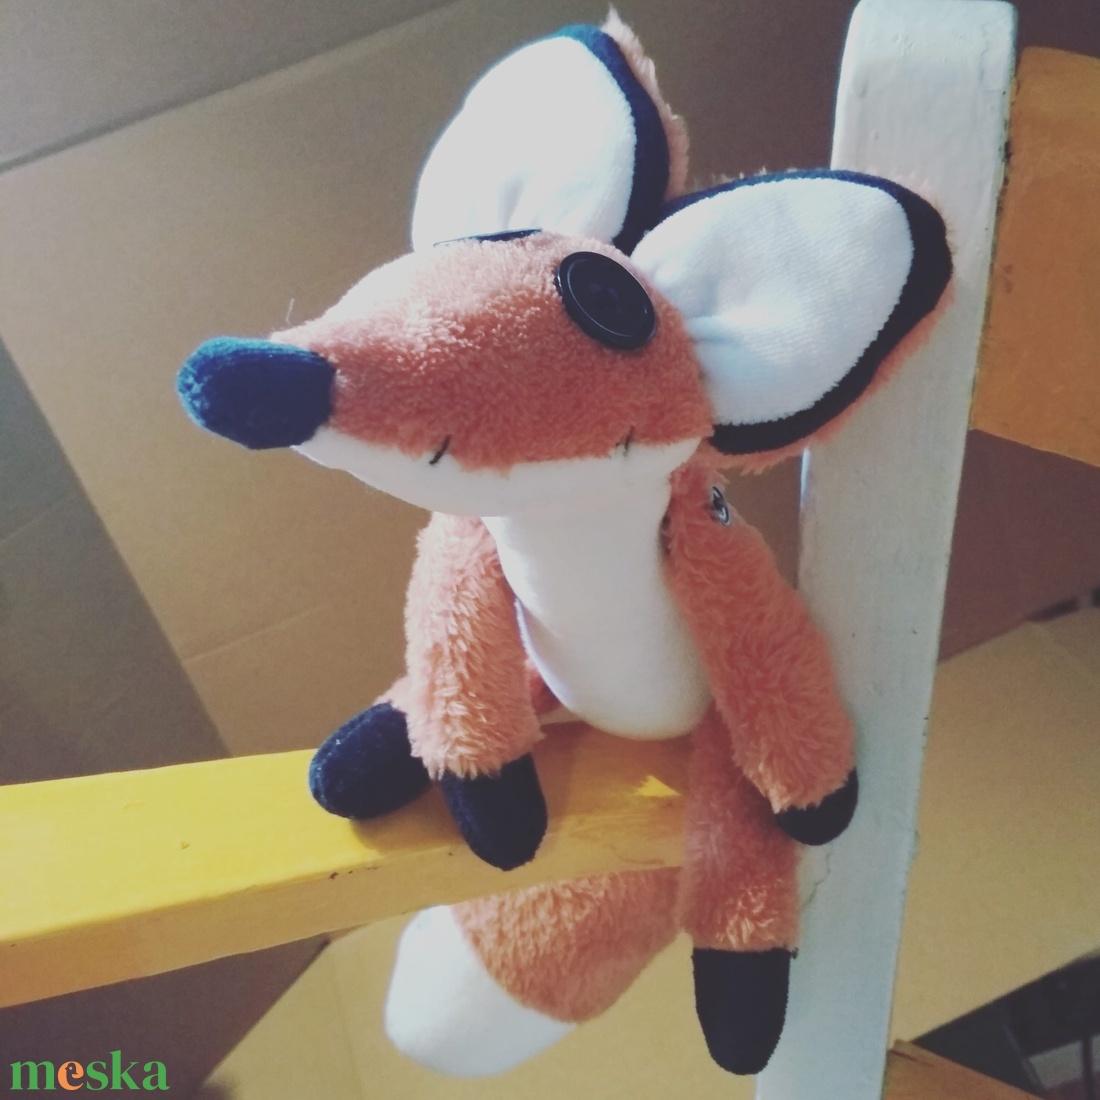 Kis herceg rókája - Meska.hu